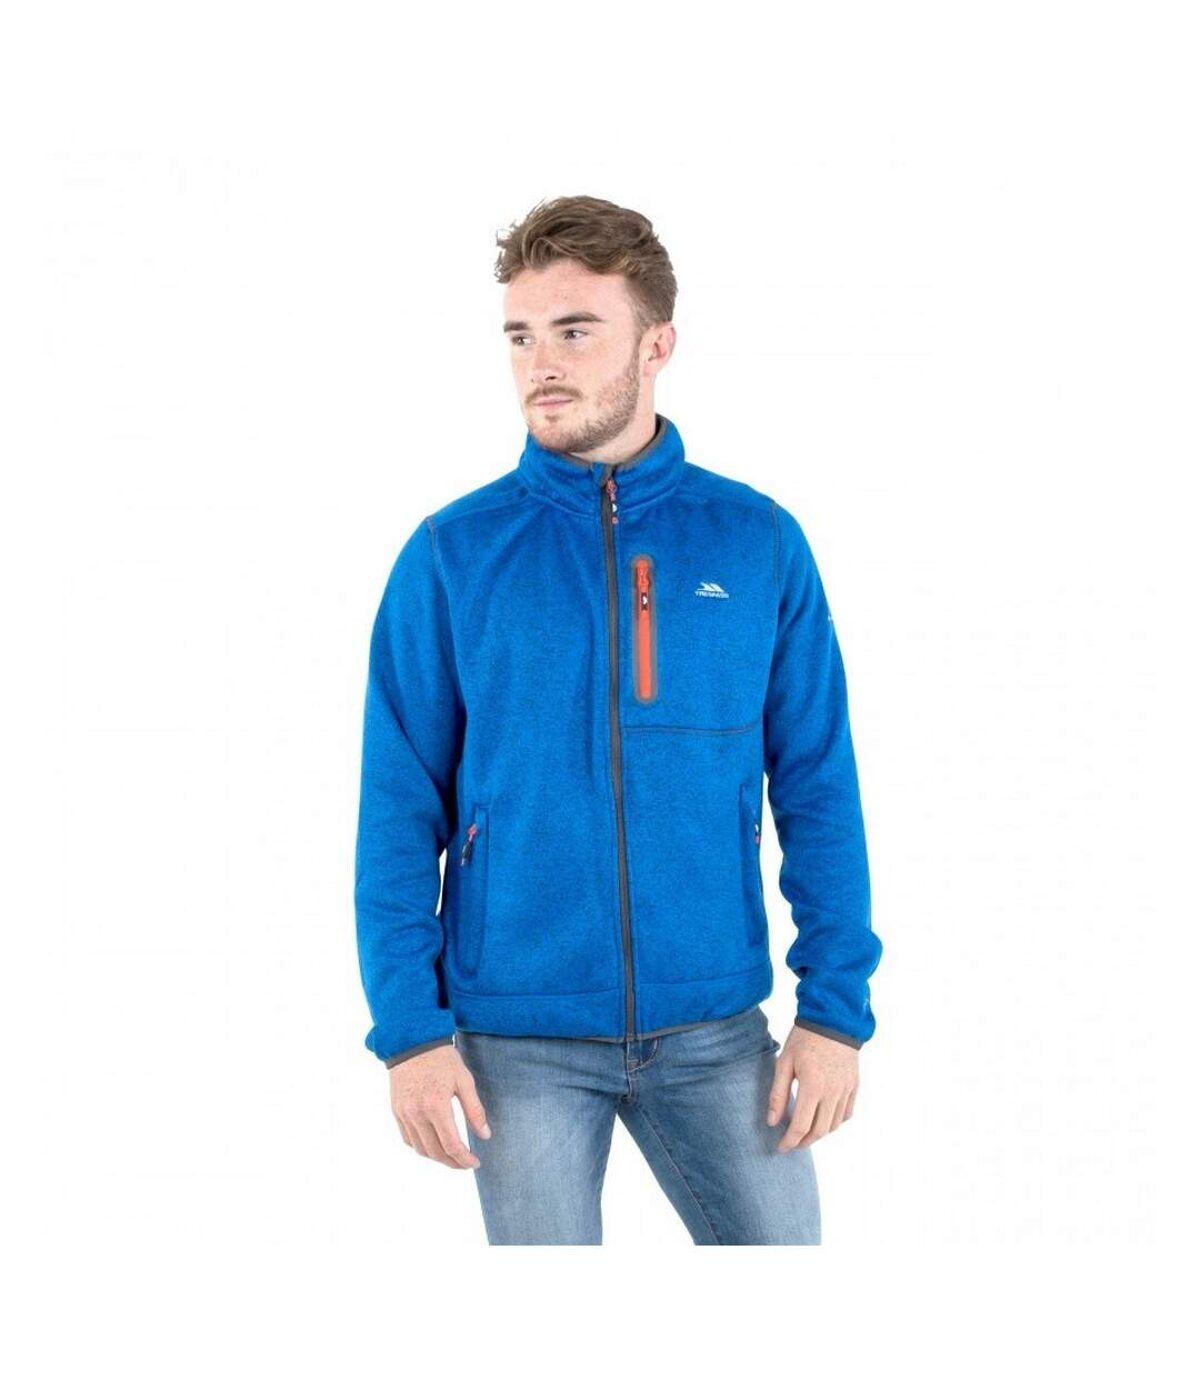 Trespass Mens Bingham Fleece Jacket (Blue Marl) - UTTP4287